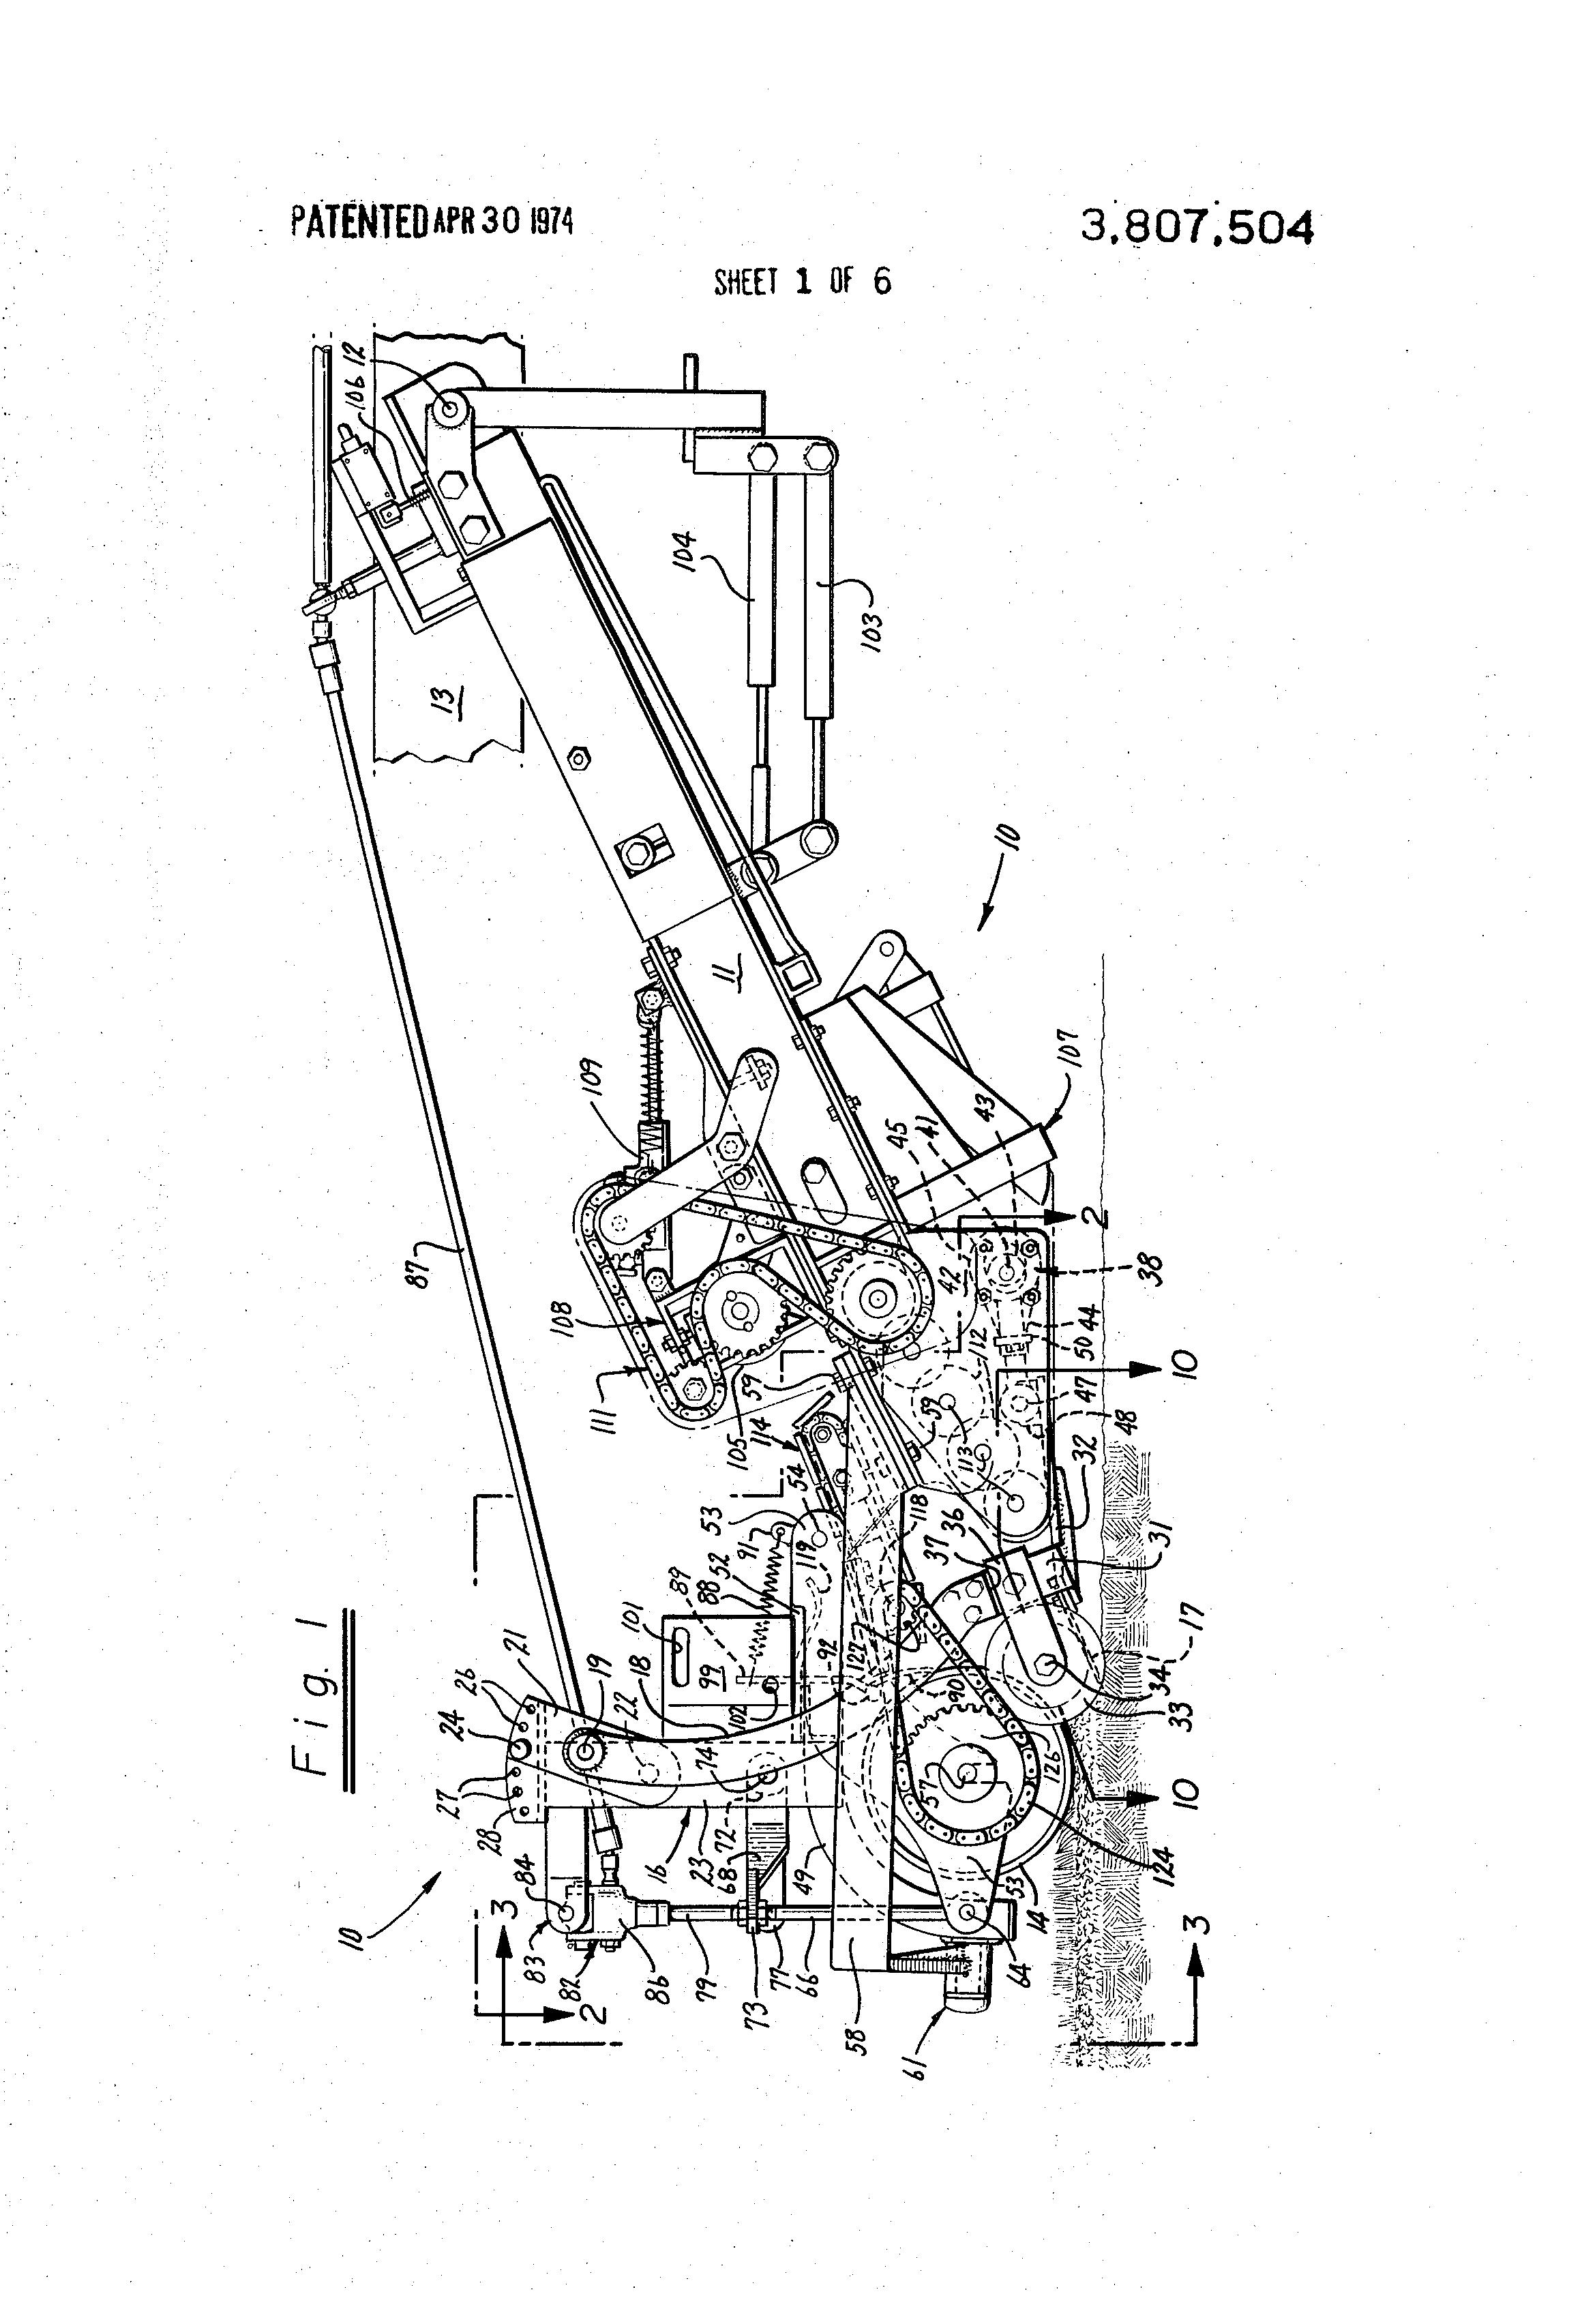 Patent US3807504 - Sod harvesting apparatus - Google Patents